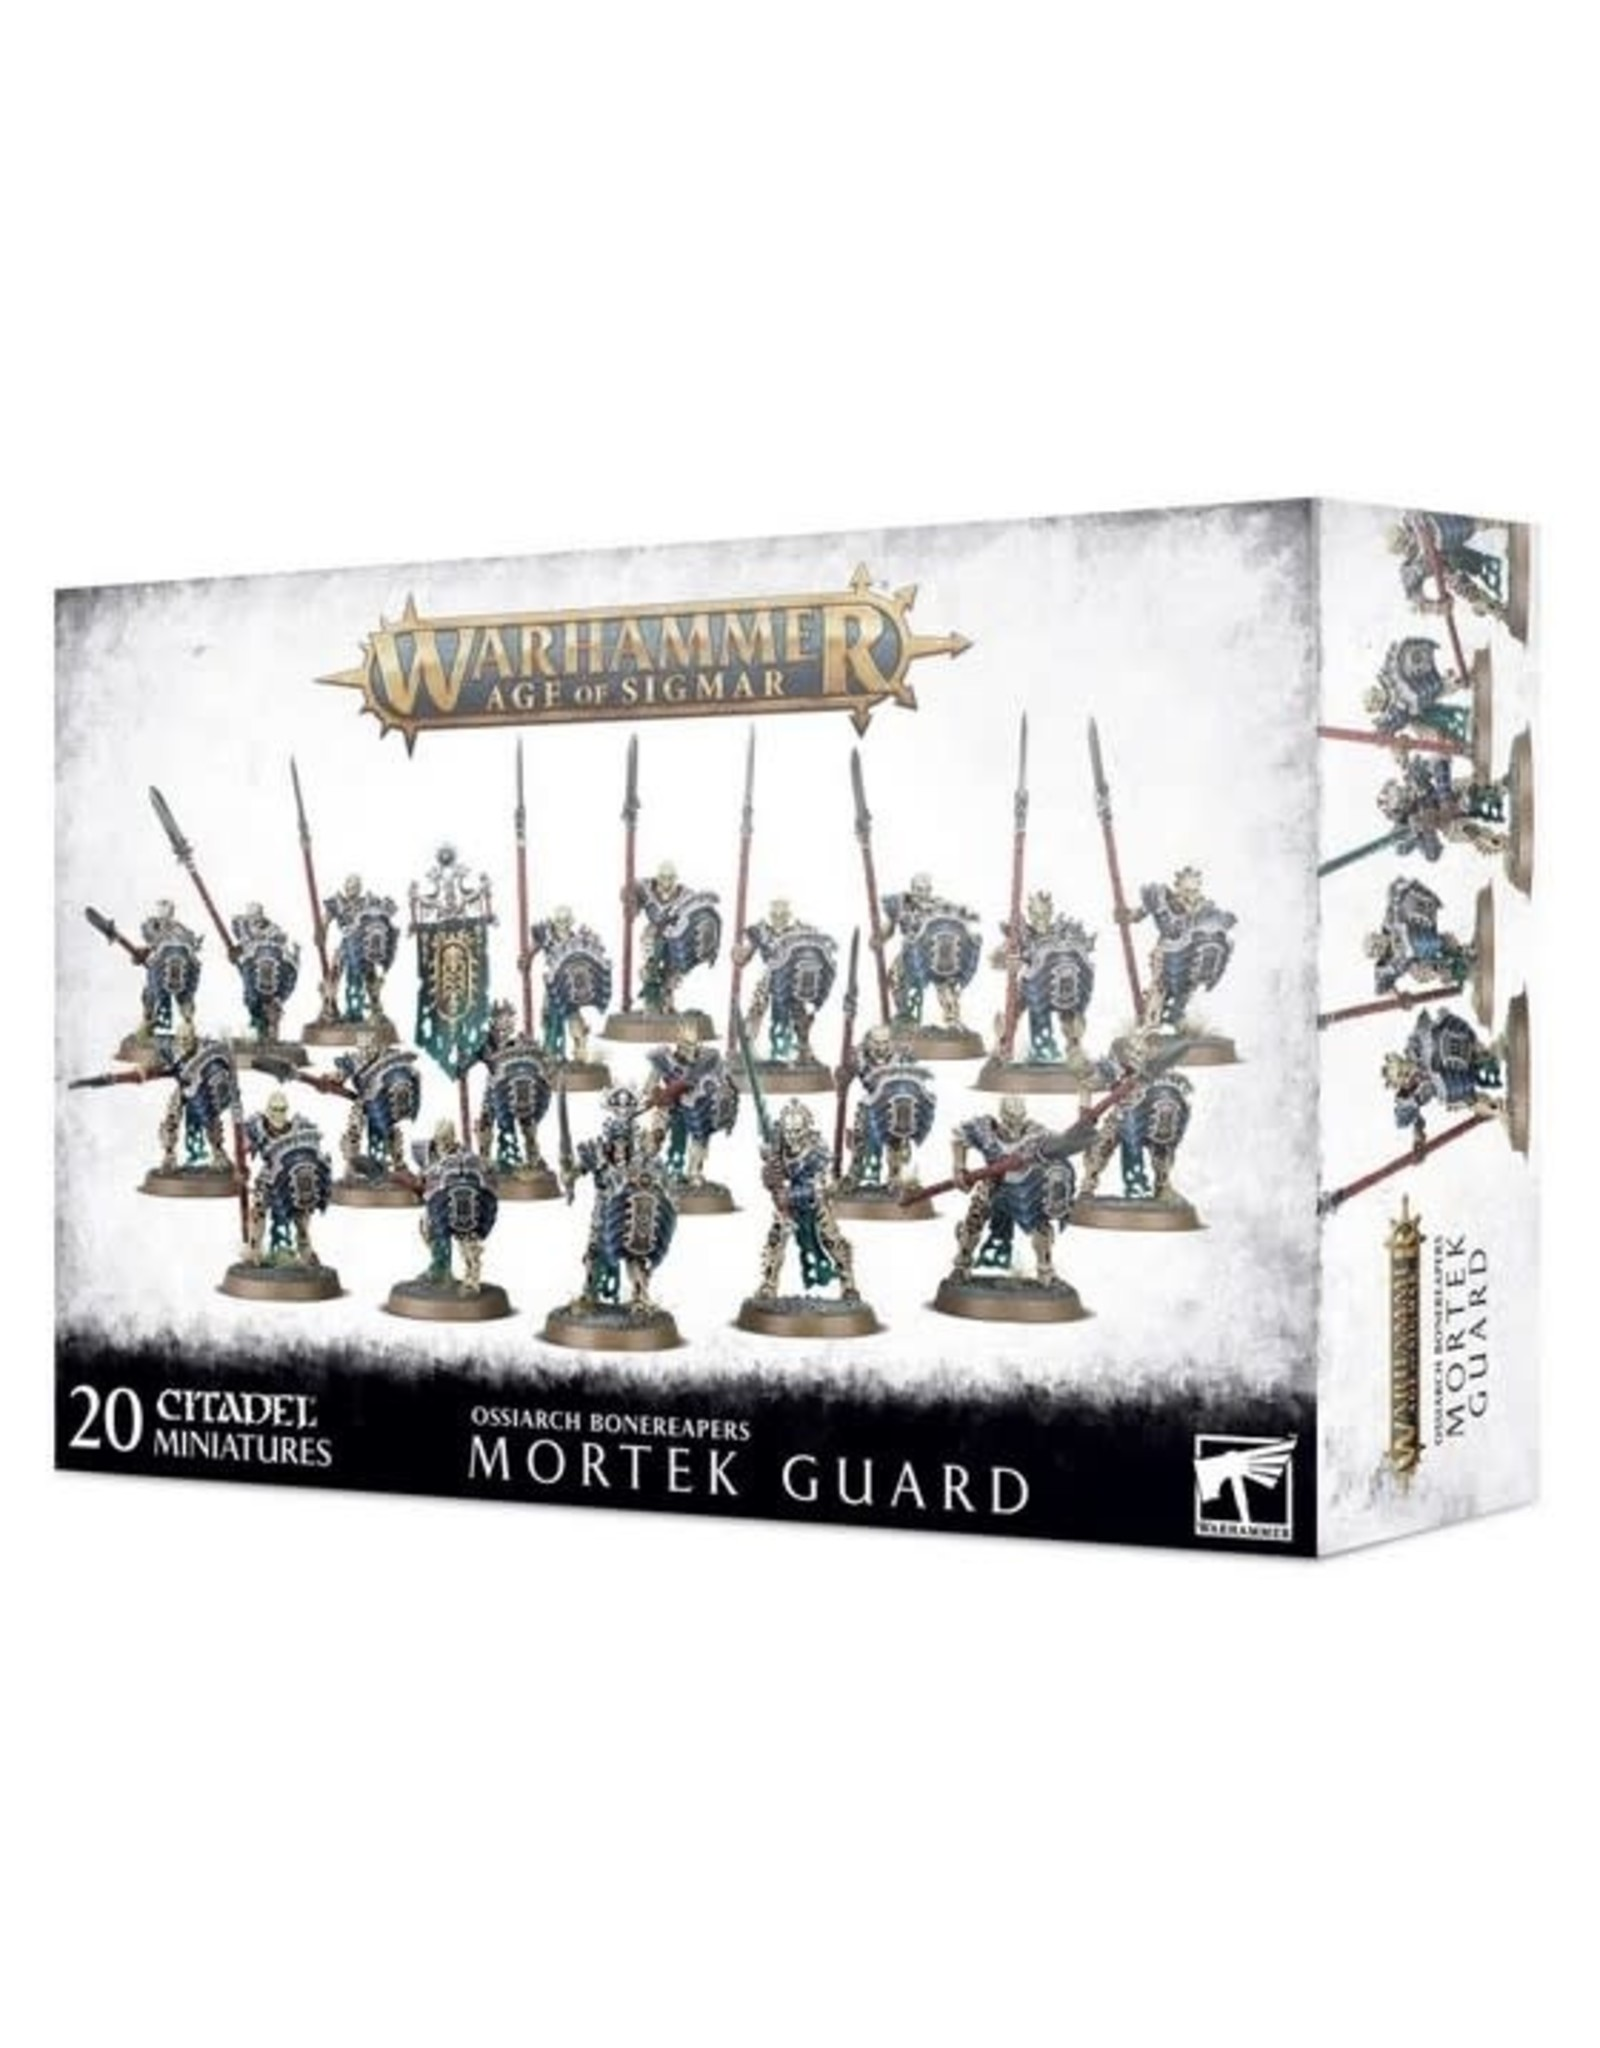 Warhammer AoS WHAoS Mortek Guard